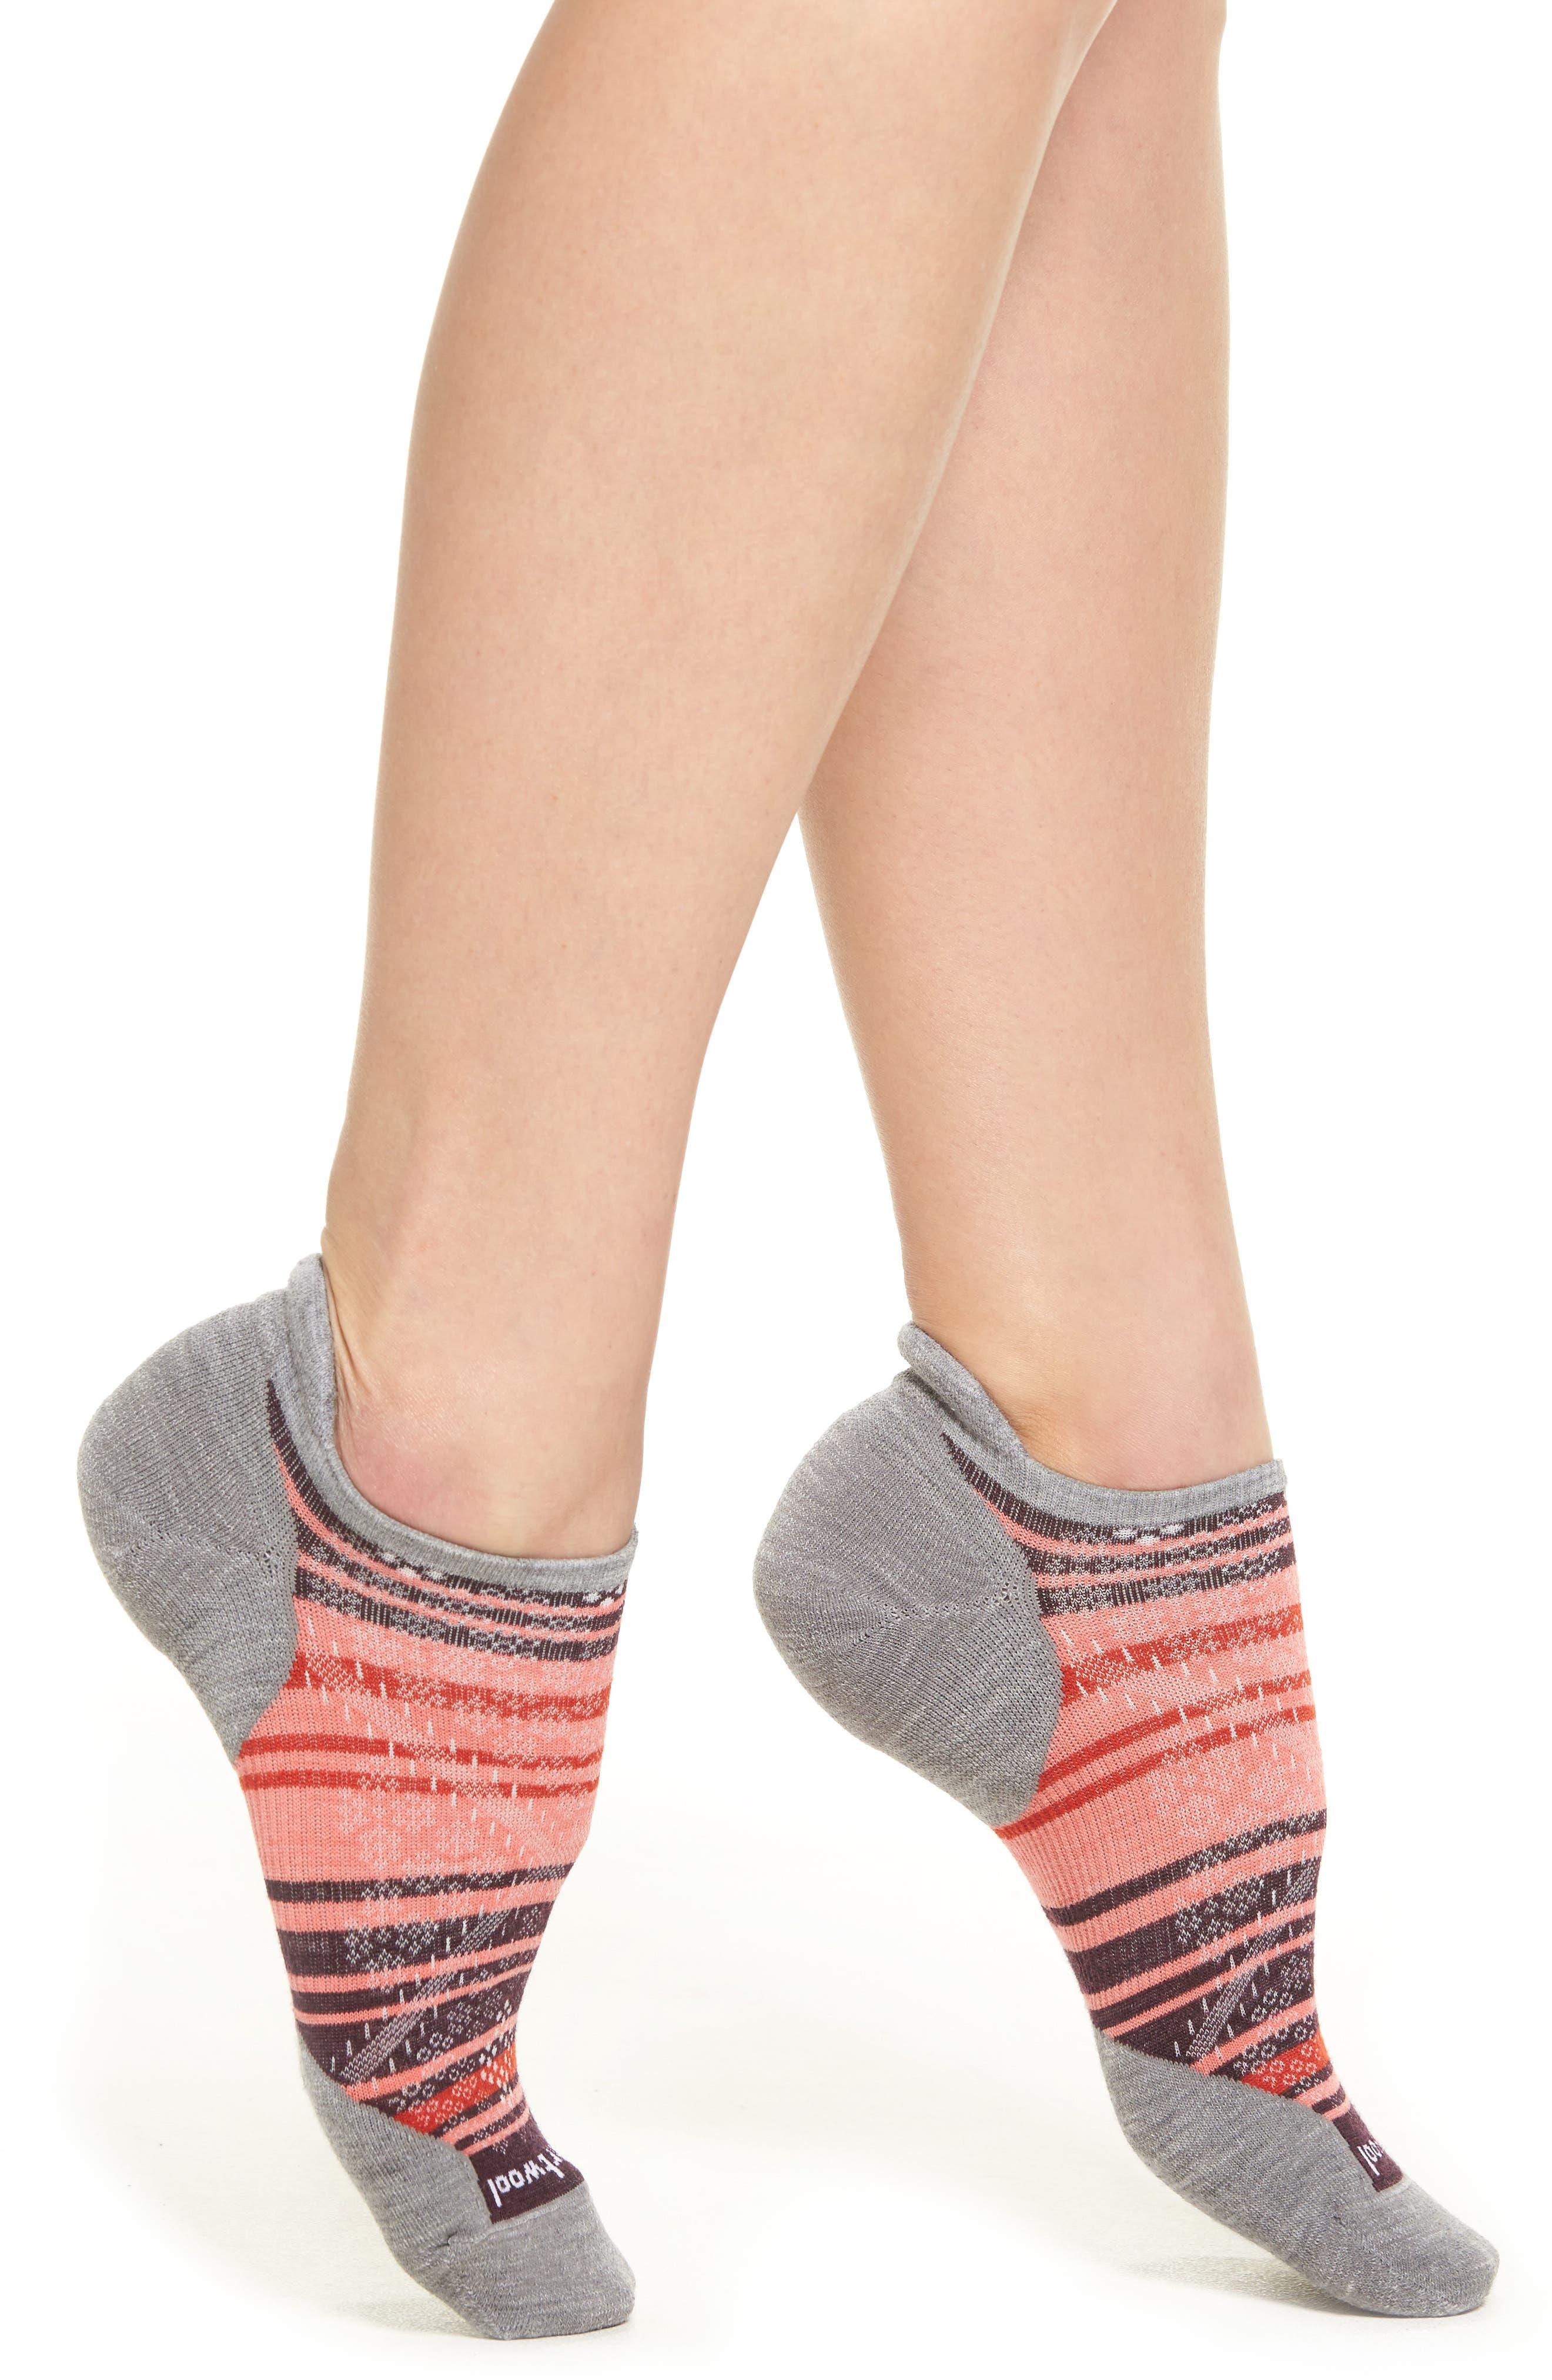 PhD Run Elite Micro No-Show Socks,                         Main,                         color, Light Gray